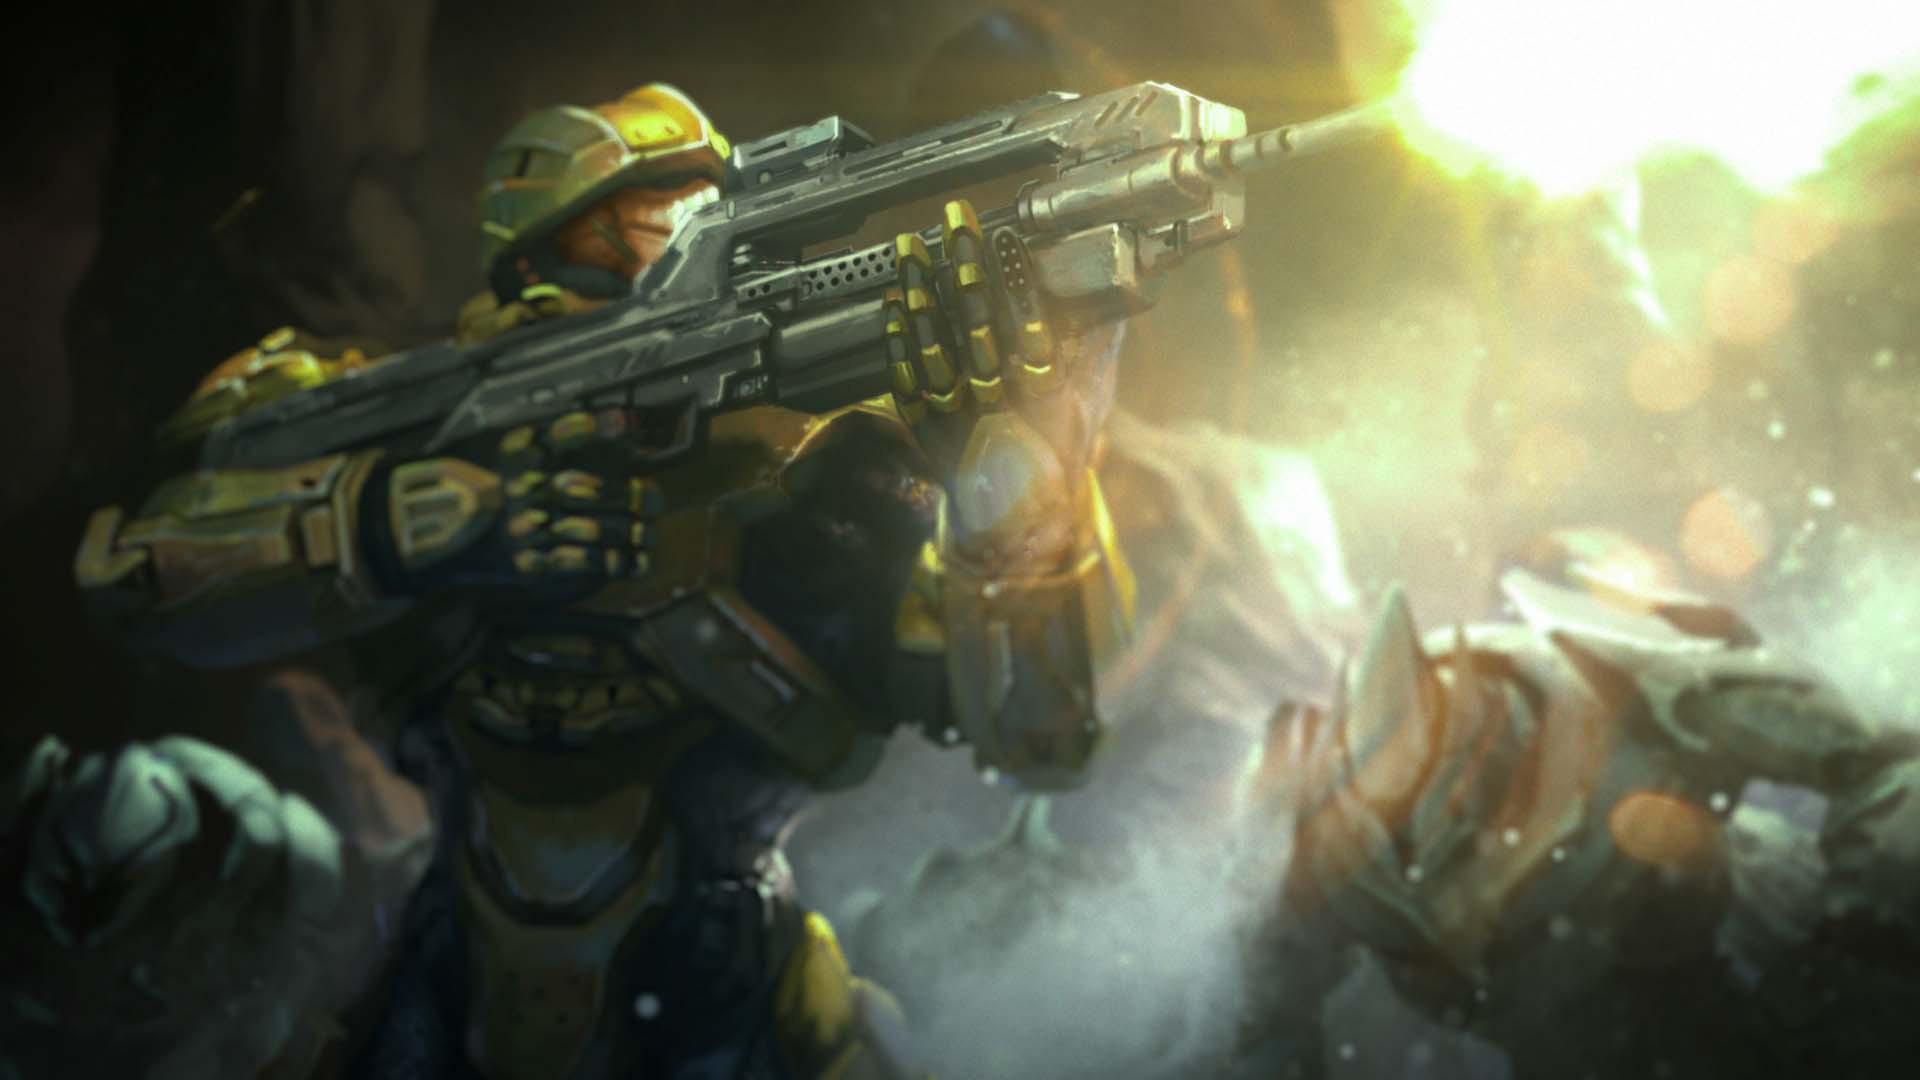 Res: 1920x1080, Halo: Spartan Assault HD Wallpaper 14 - 1920 X 1080